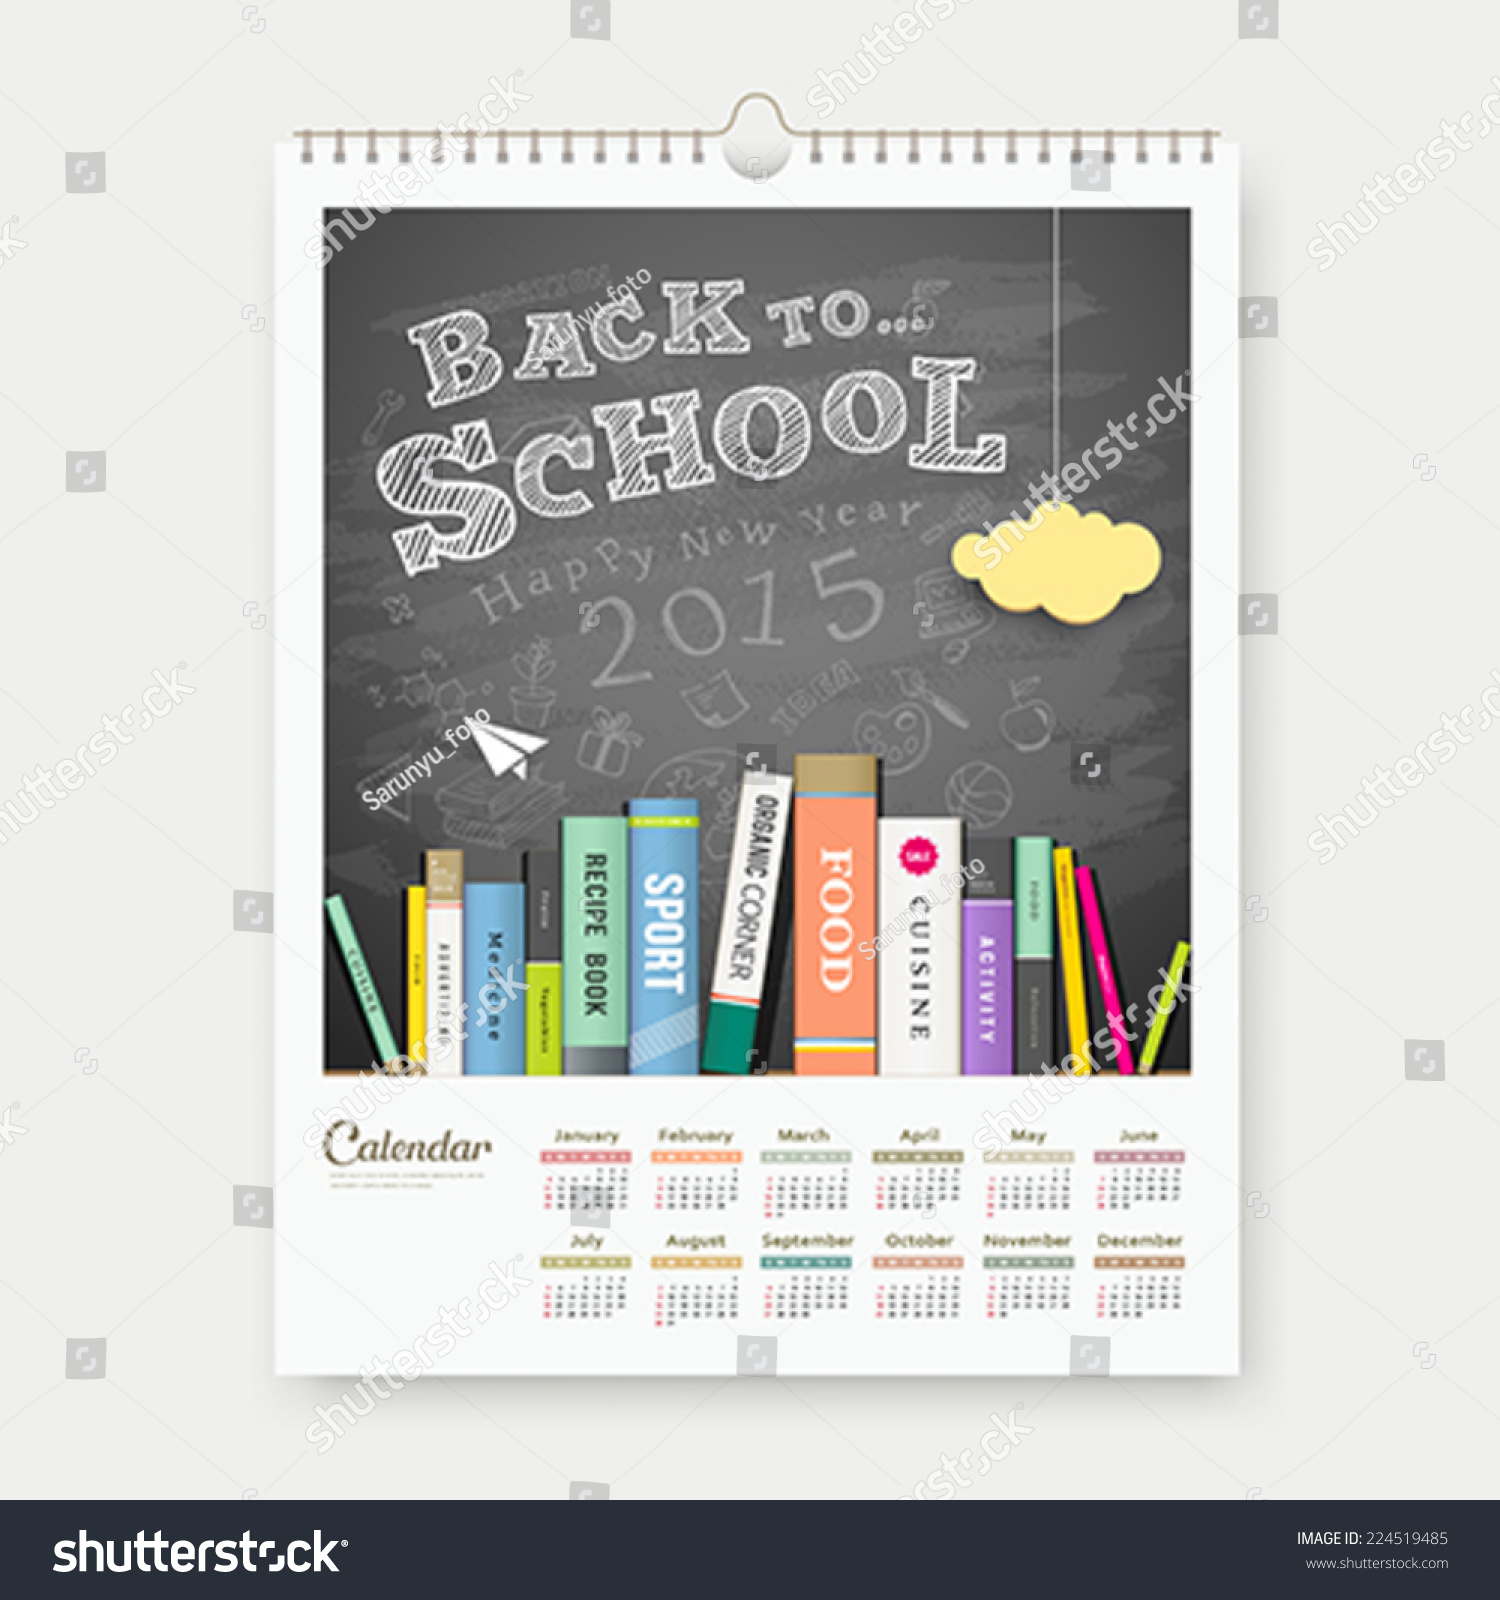 Calendar Design For School : Calendar back to school with books concept design